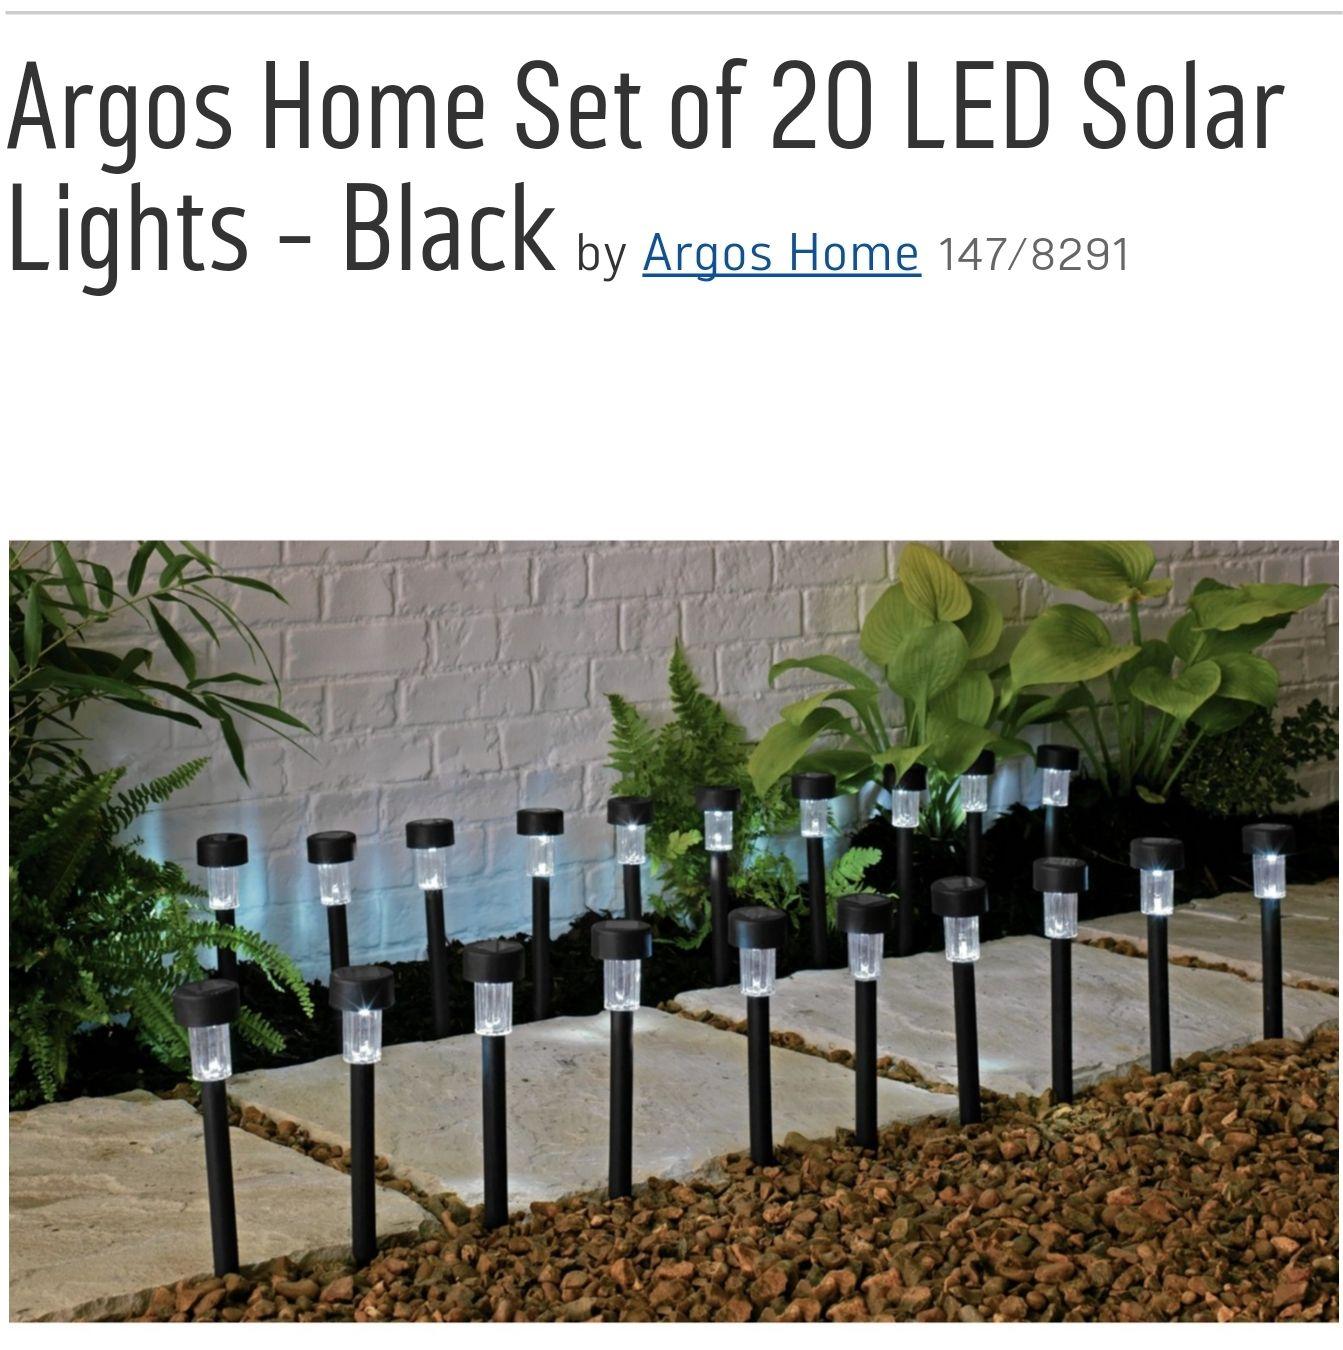 Argos Home Set of 20 Pack LED Solar Lights  - Black £10.99 - Good reviews, 55p/light